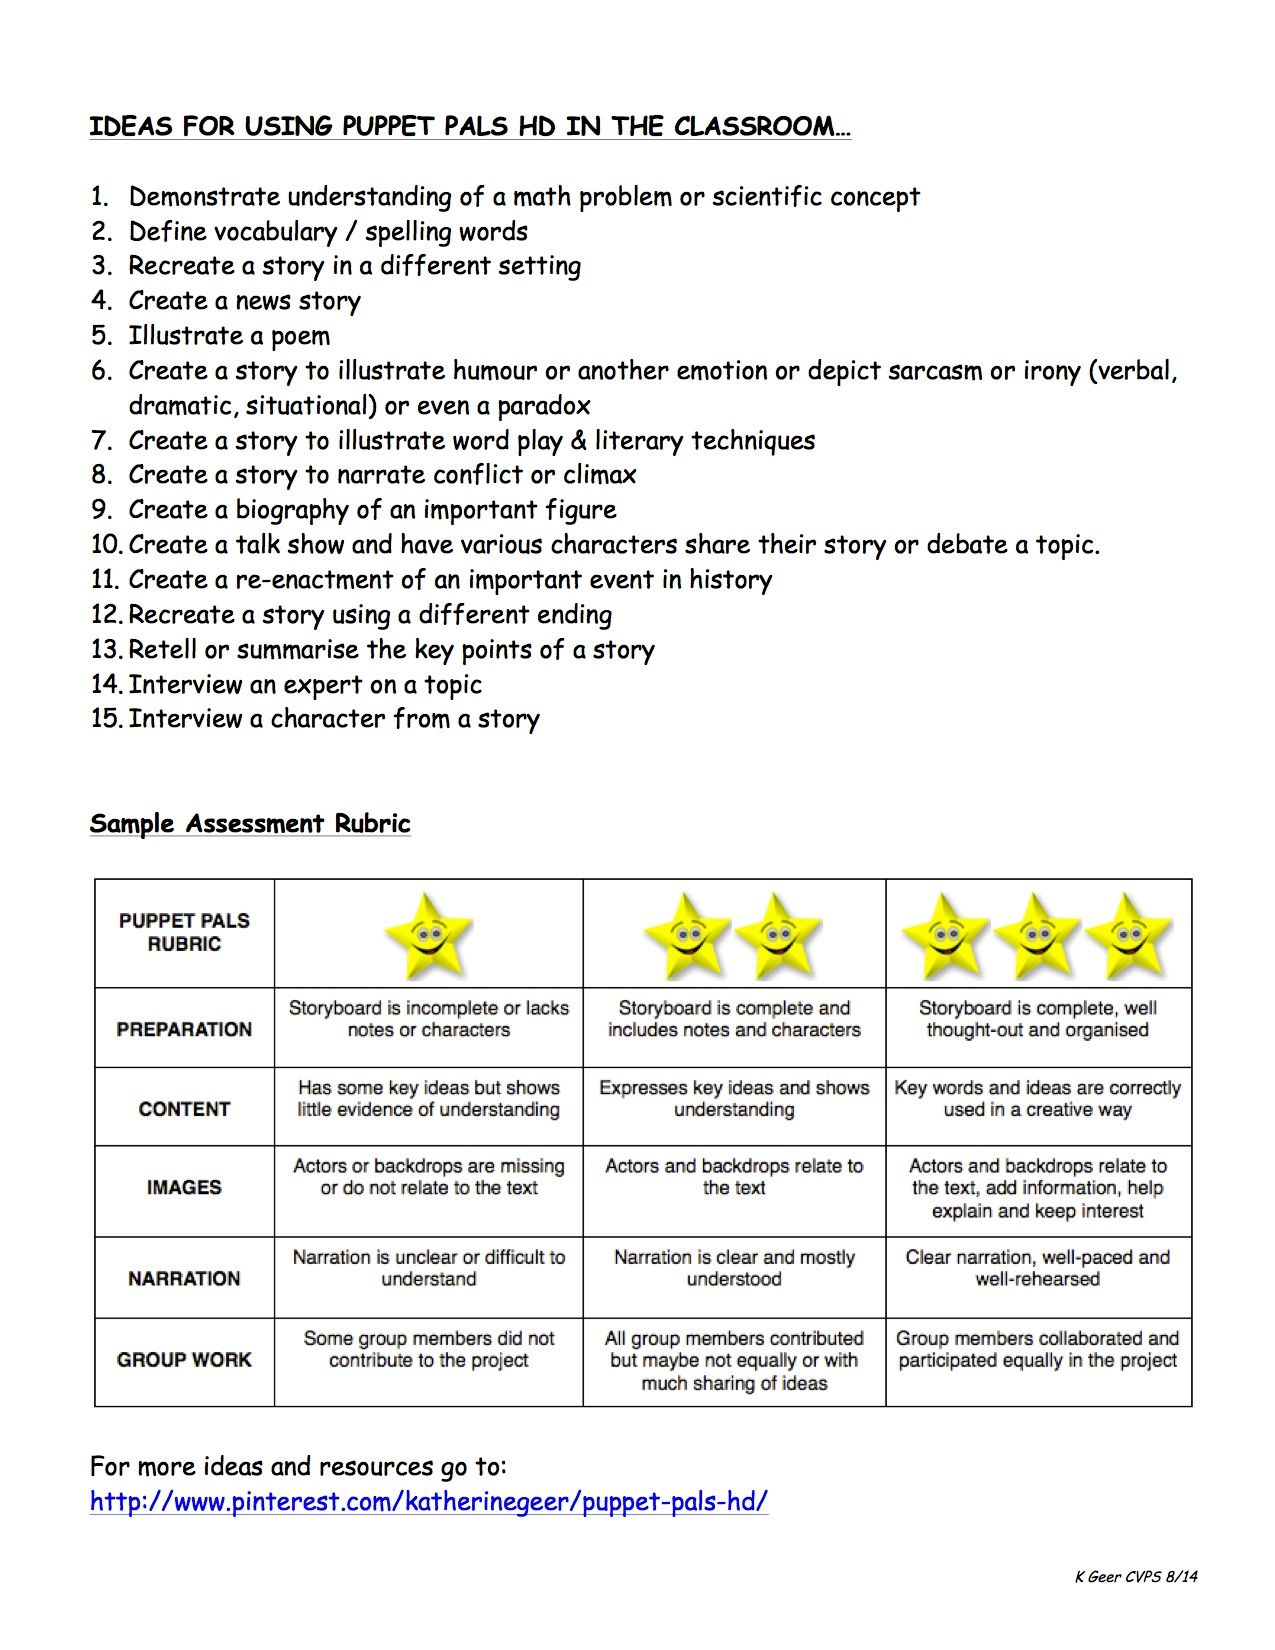 Puppet Pals HD classroom ideas plus a sample assessment rubric – Sample Assessment